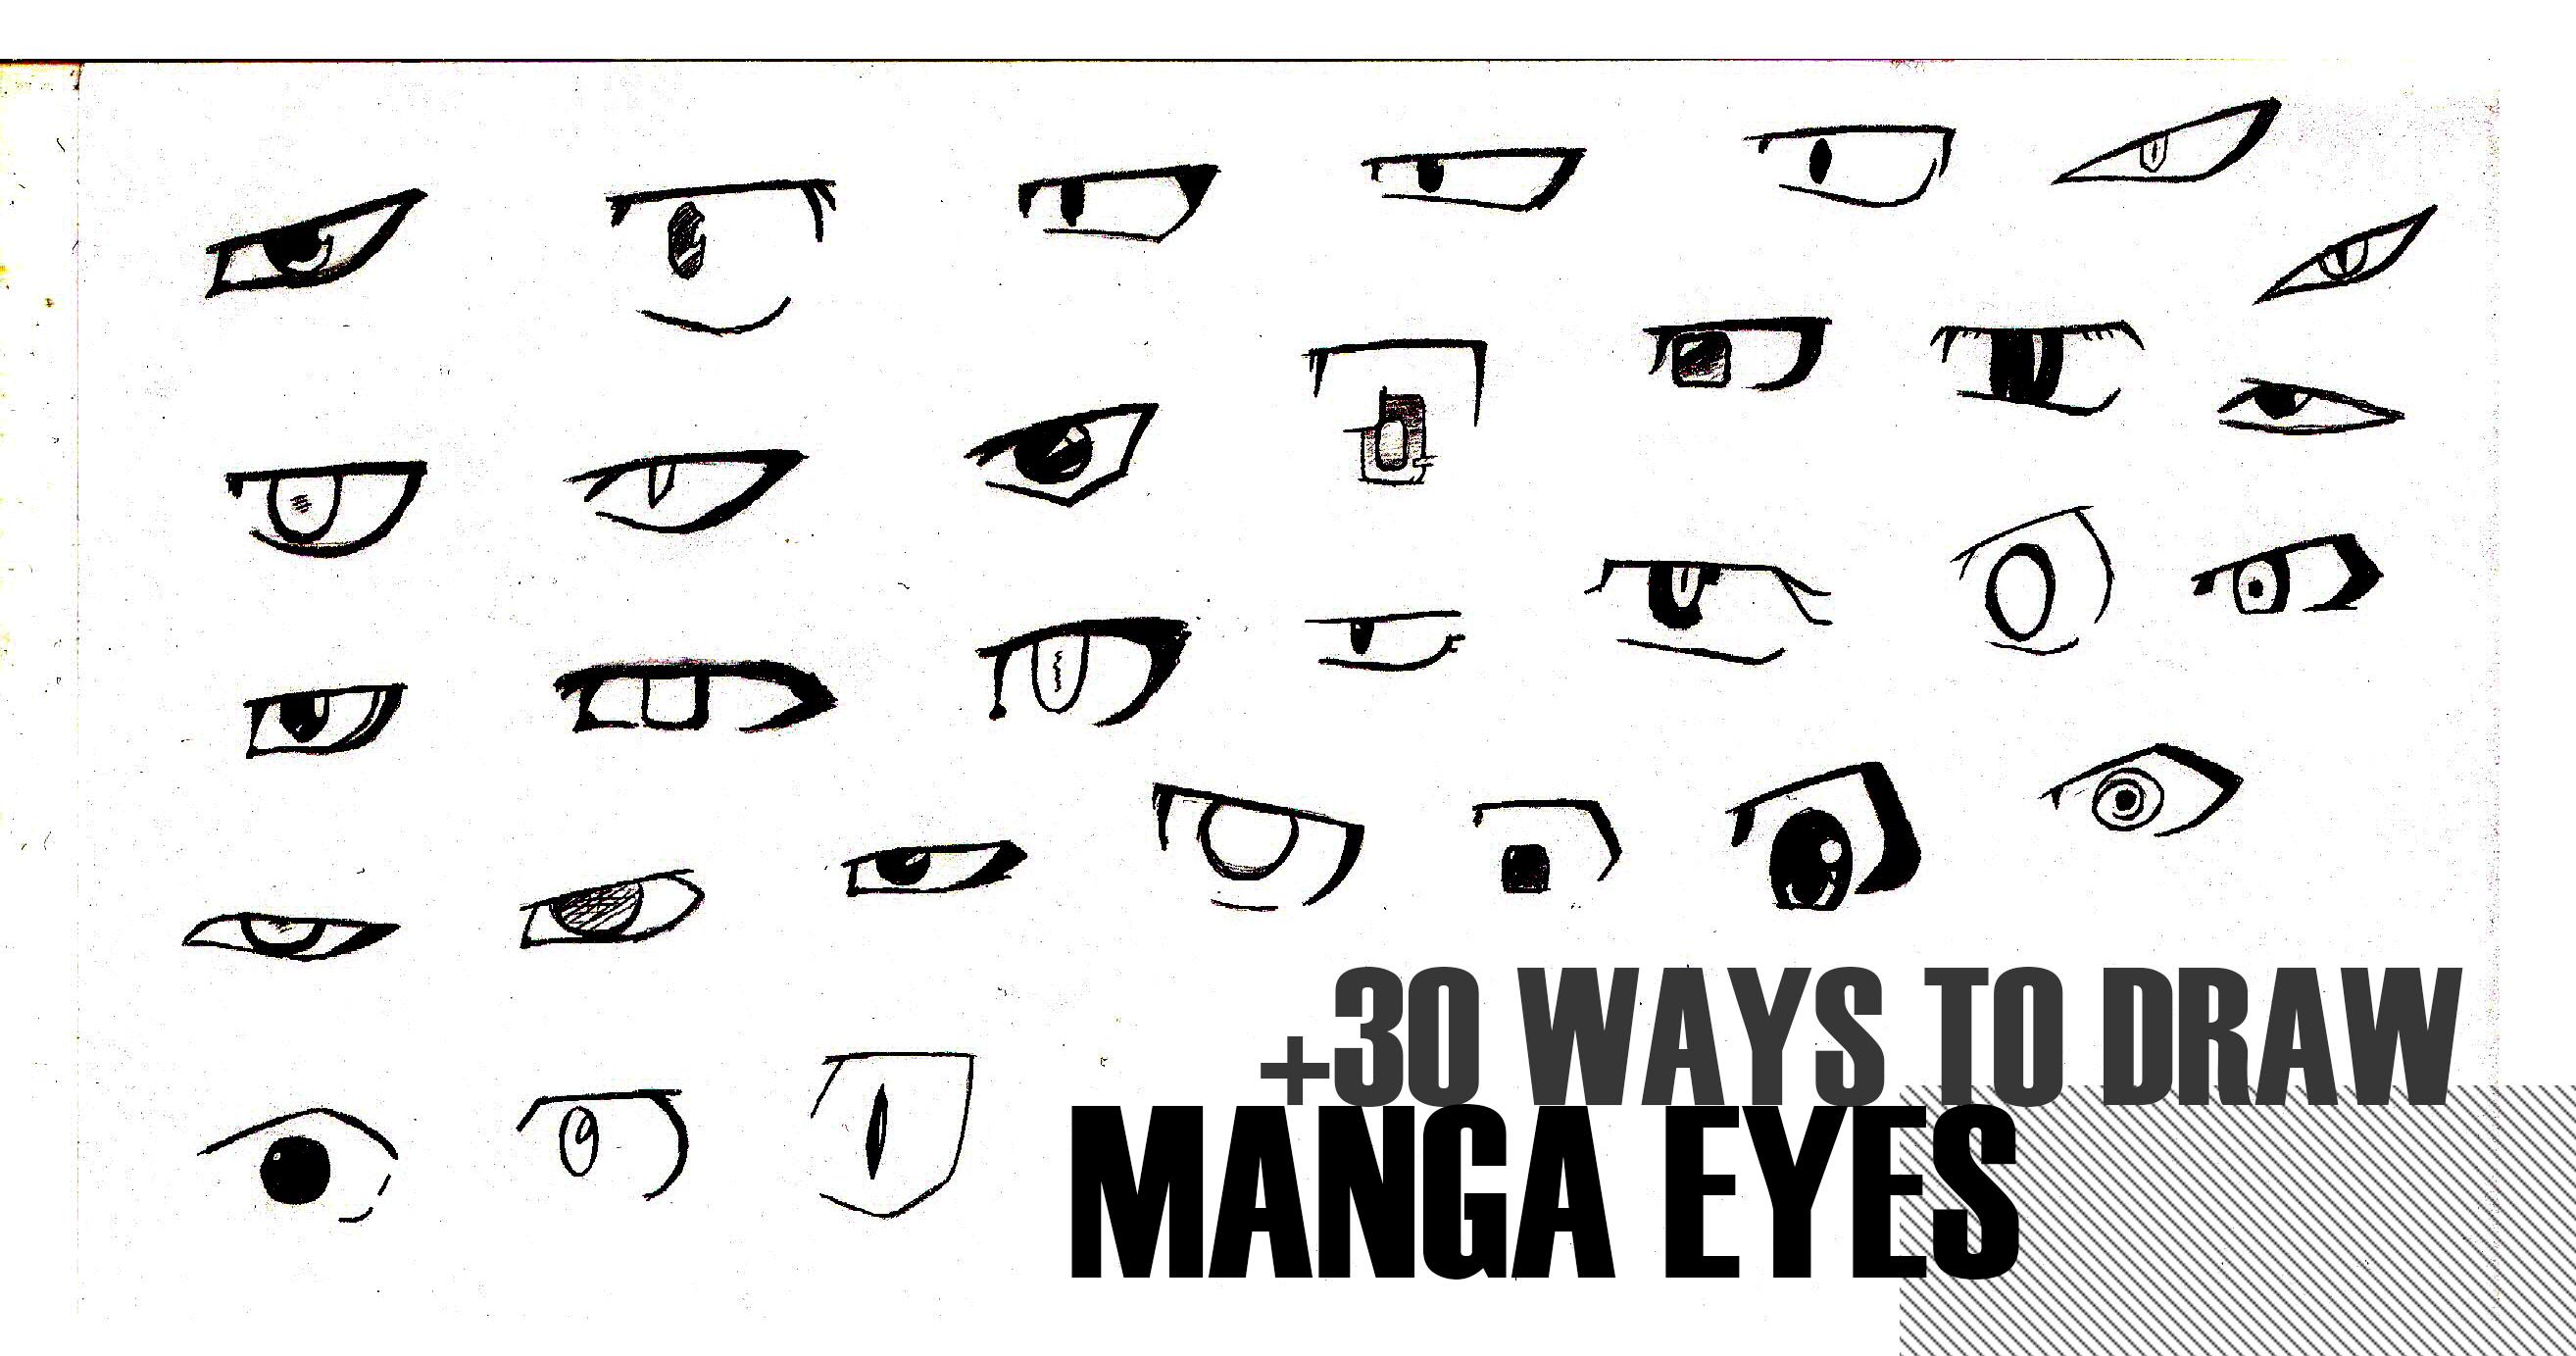 Ways to draw manga eyes by mangakaofficial